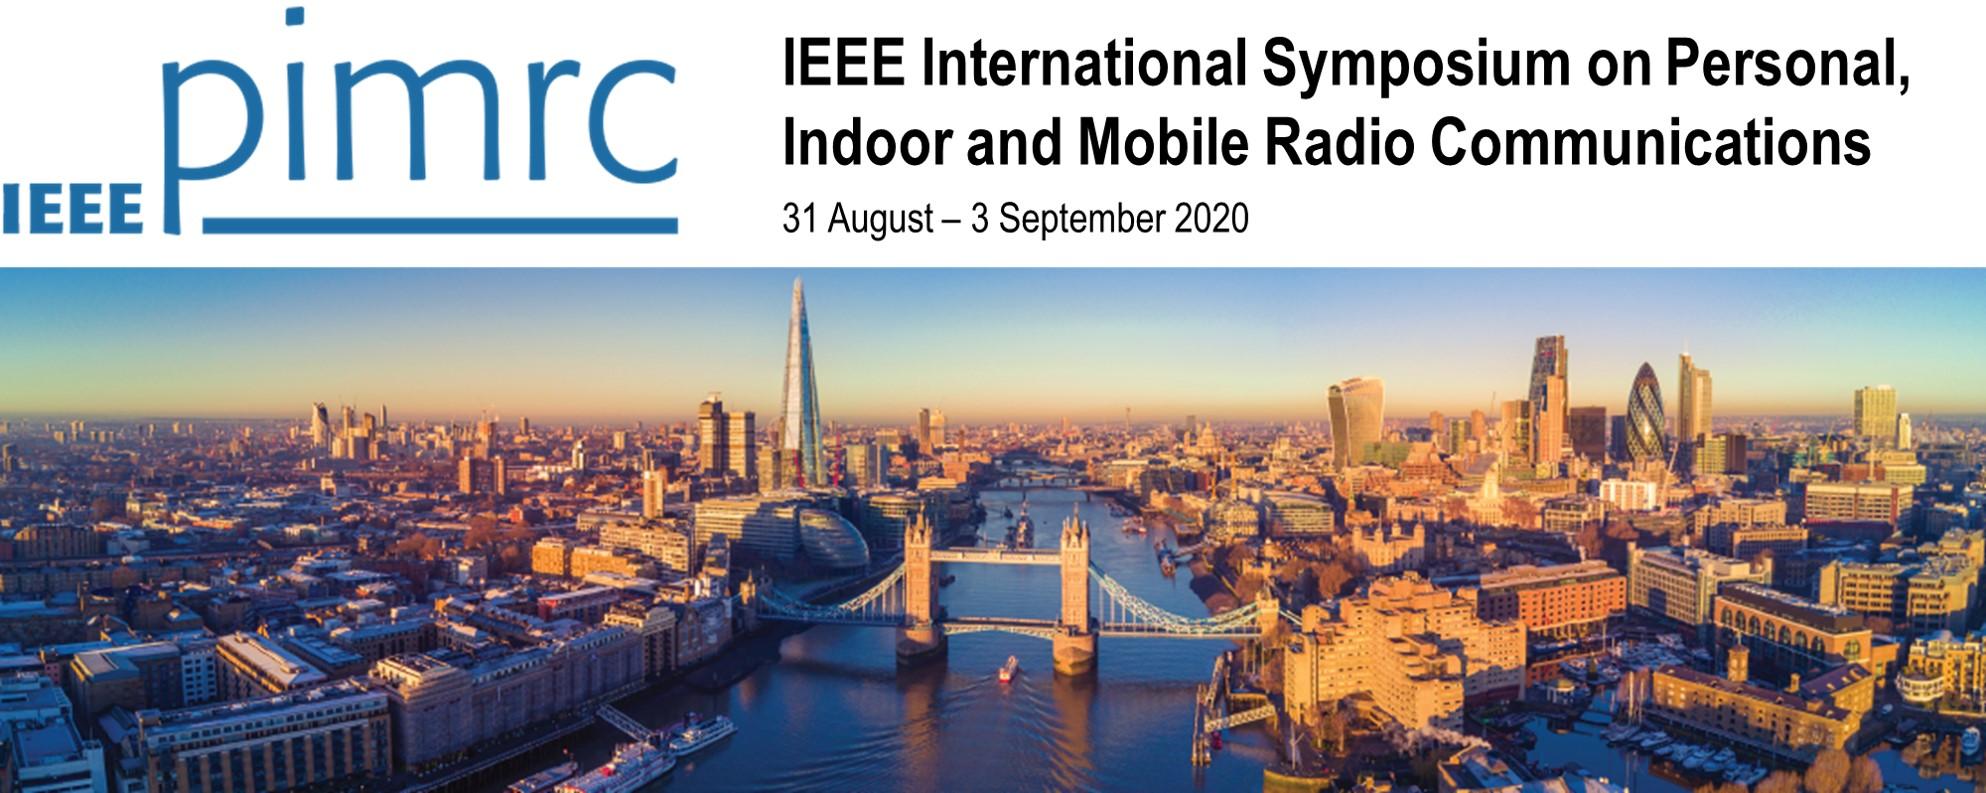 IEEE, Conference, Symposium, Mobile, Radio, PIMRC, British Business Bank, 5g, 5g-encode, Bristol , Bristol city, University of Bristol, private networks, private LTE network, private 5G network, network slicing, network splicing, network visualization , networking, GUI, network topology, dashboard, wireless, LTE, LAN, 5G, Wi-Fi, mobile, network automation, network optimisation, network visibility, network monitoring